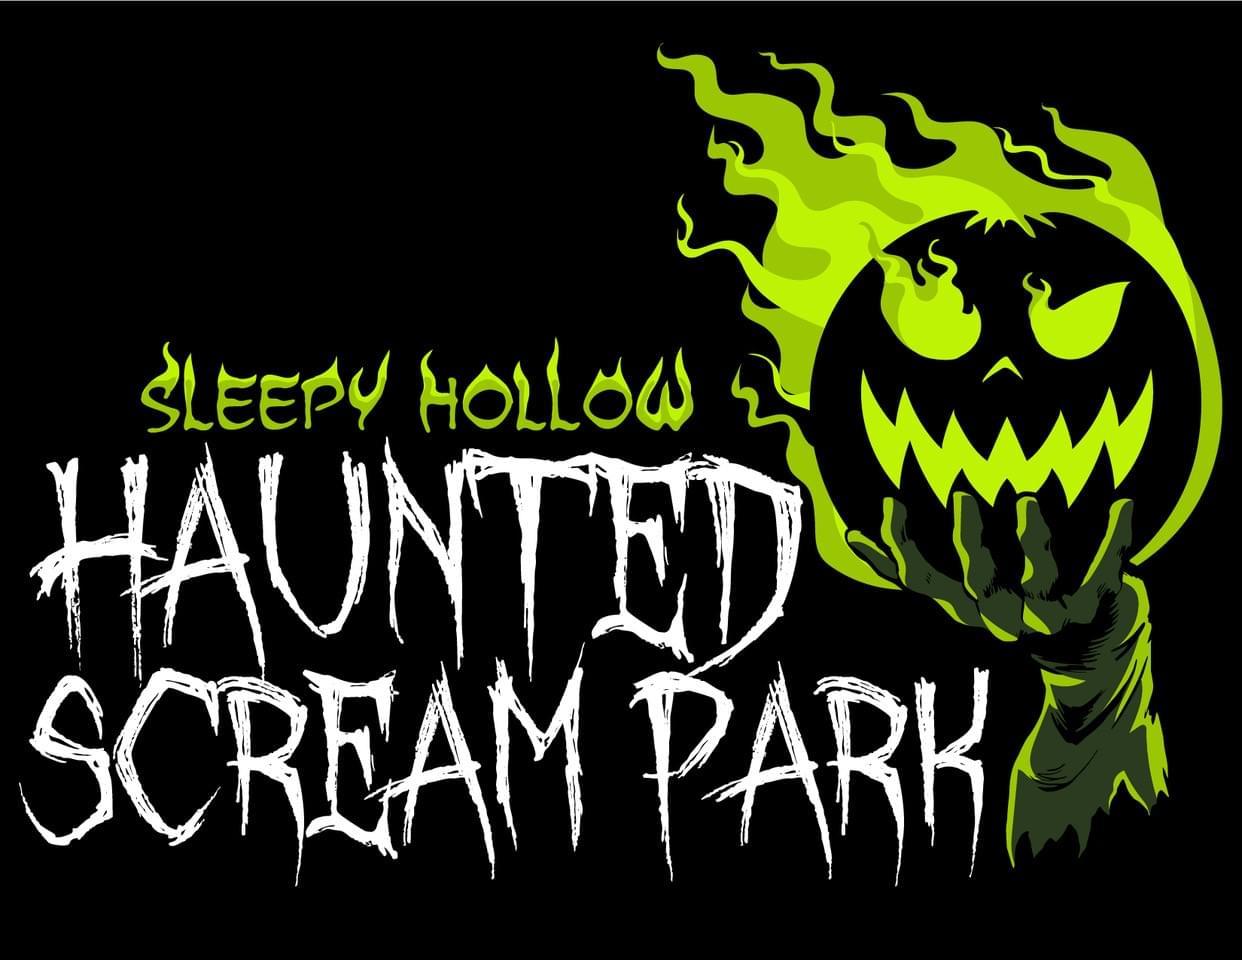 Scream park logo black back ground